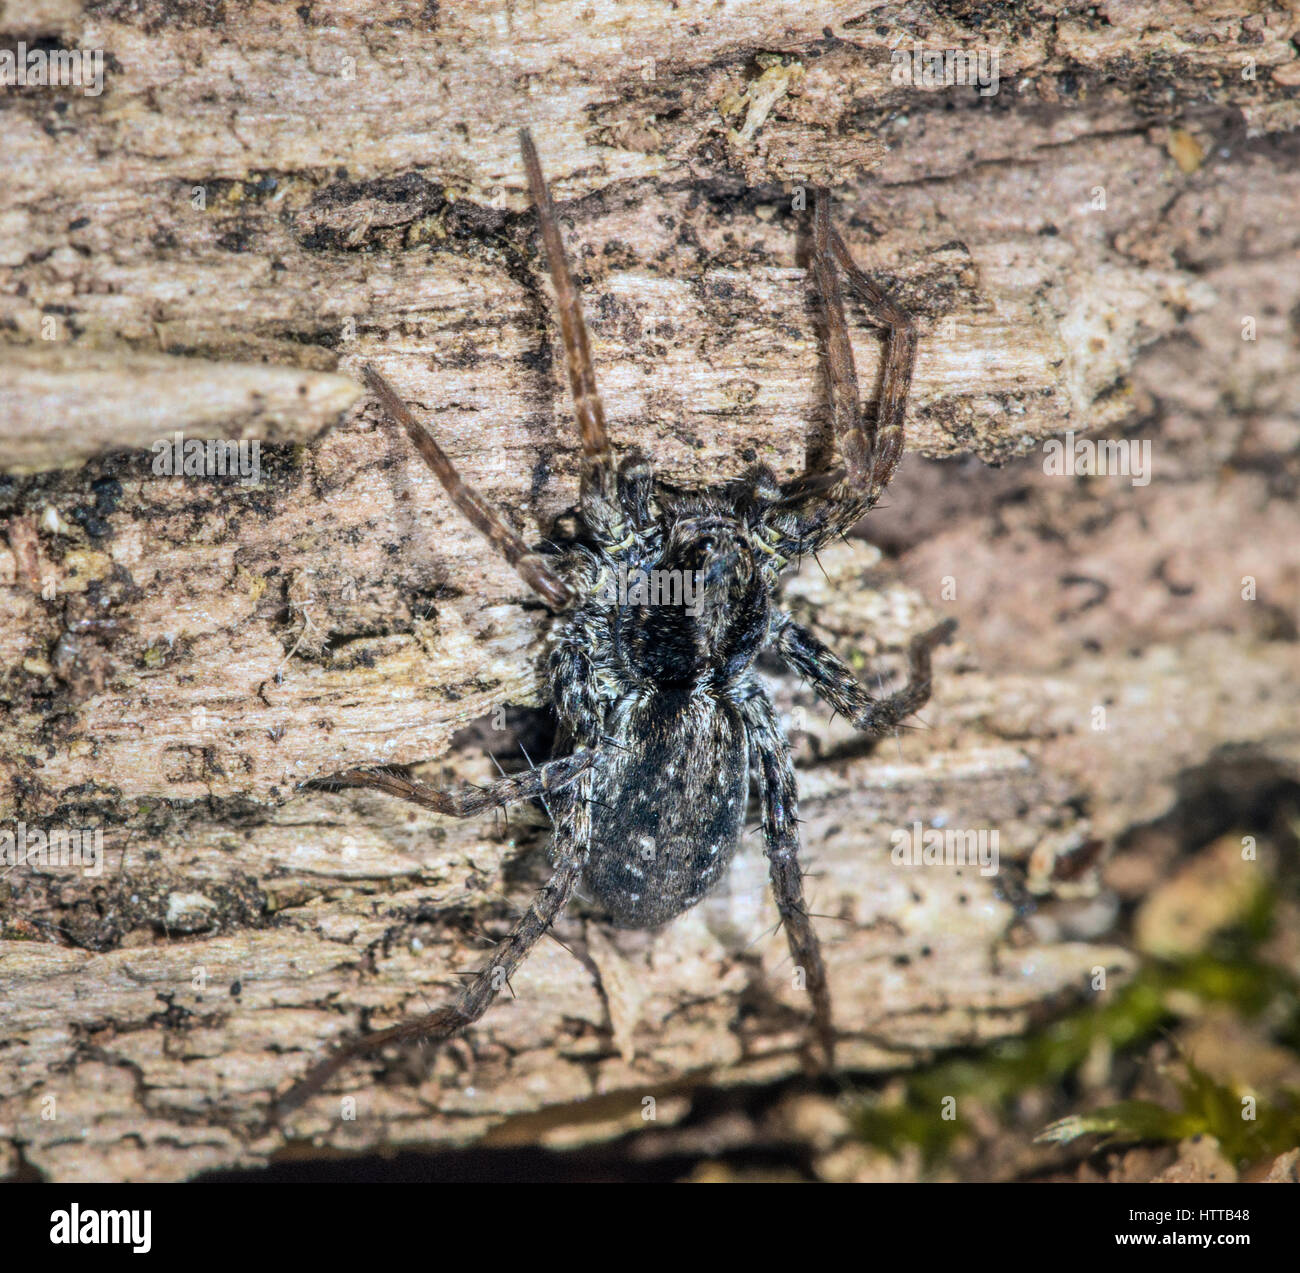 Pardosa spider resting on decaying wood, United Kingdom. - Stock Image